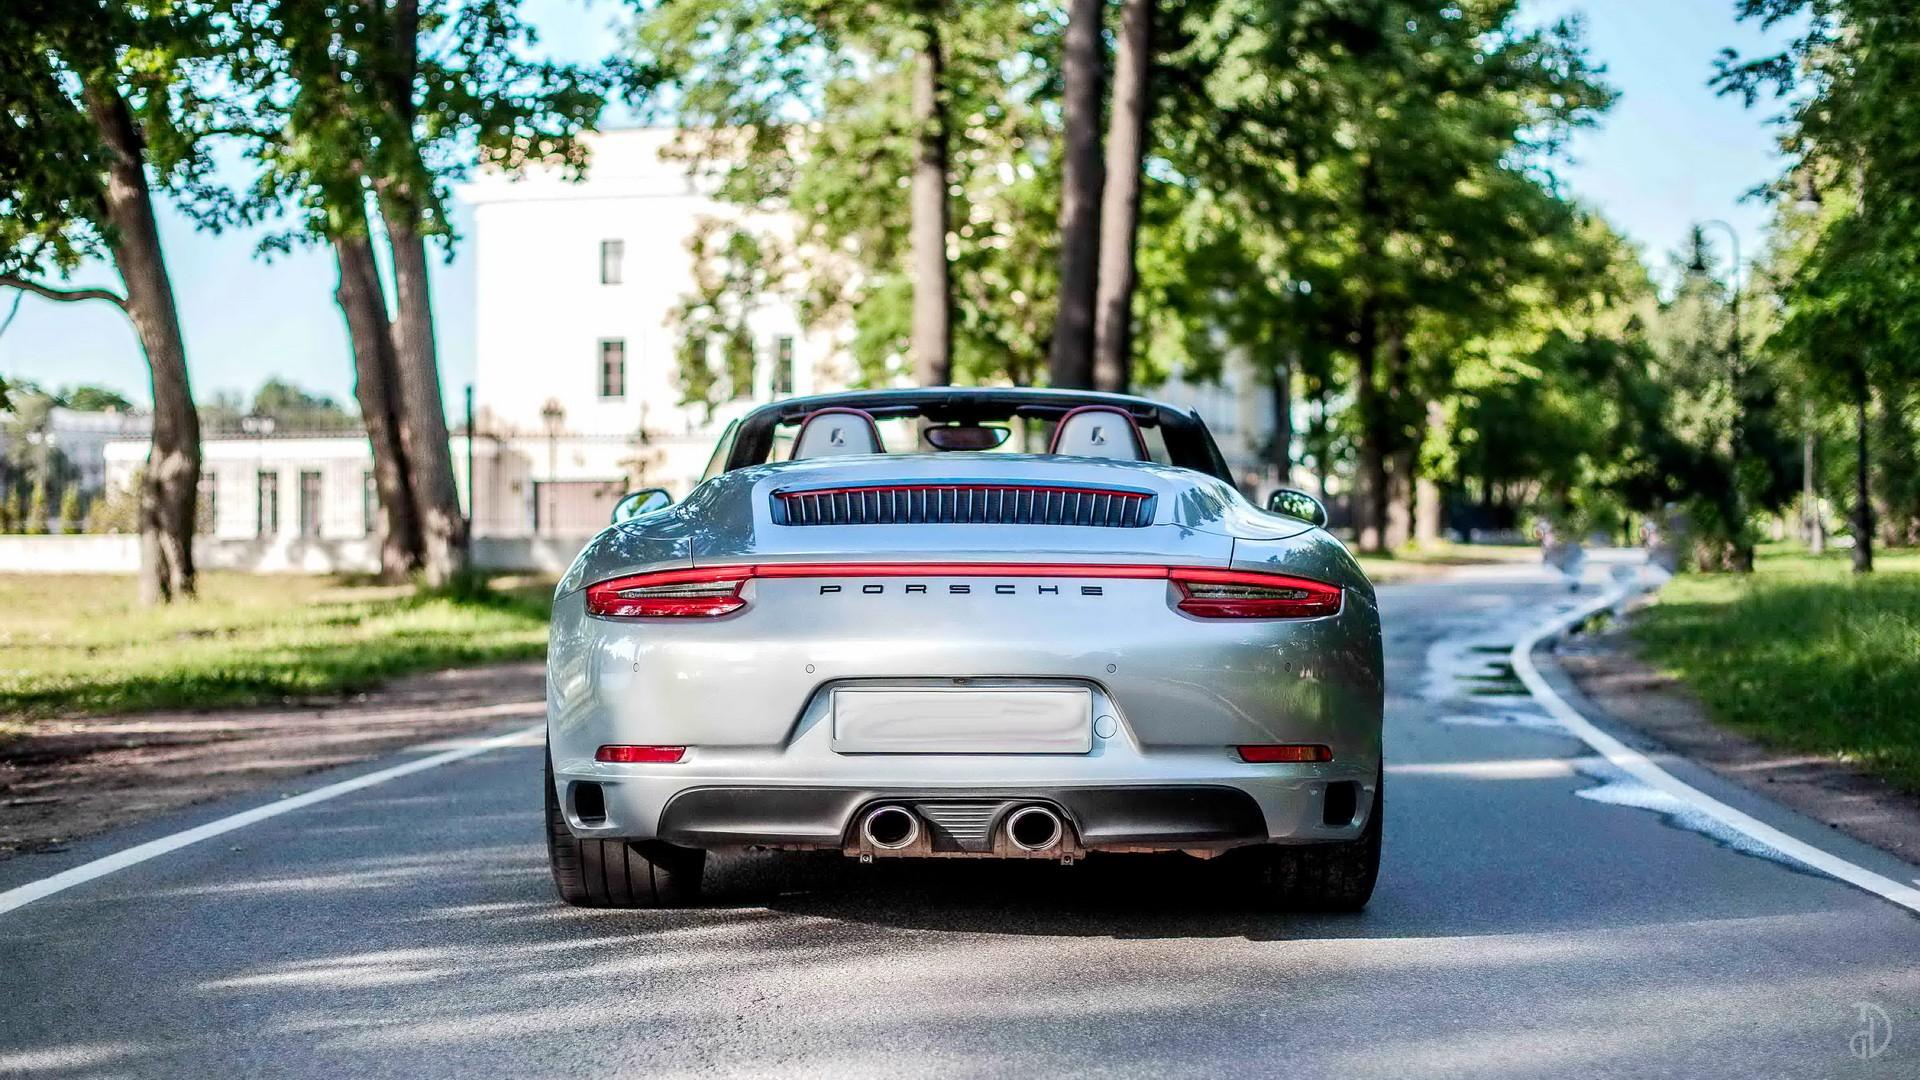 Аренда Porsche 911 Carrera 4S Cabriolet в Москве. Фото 5